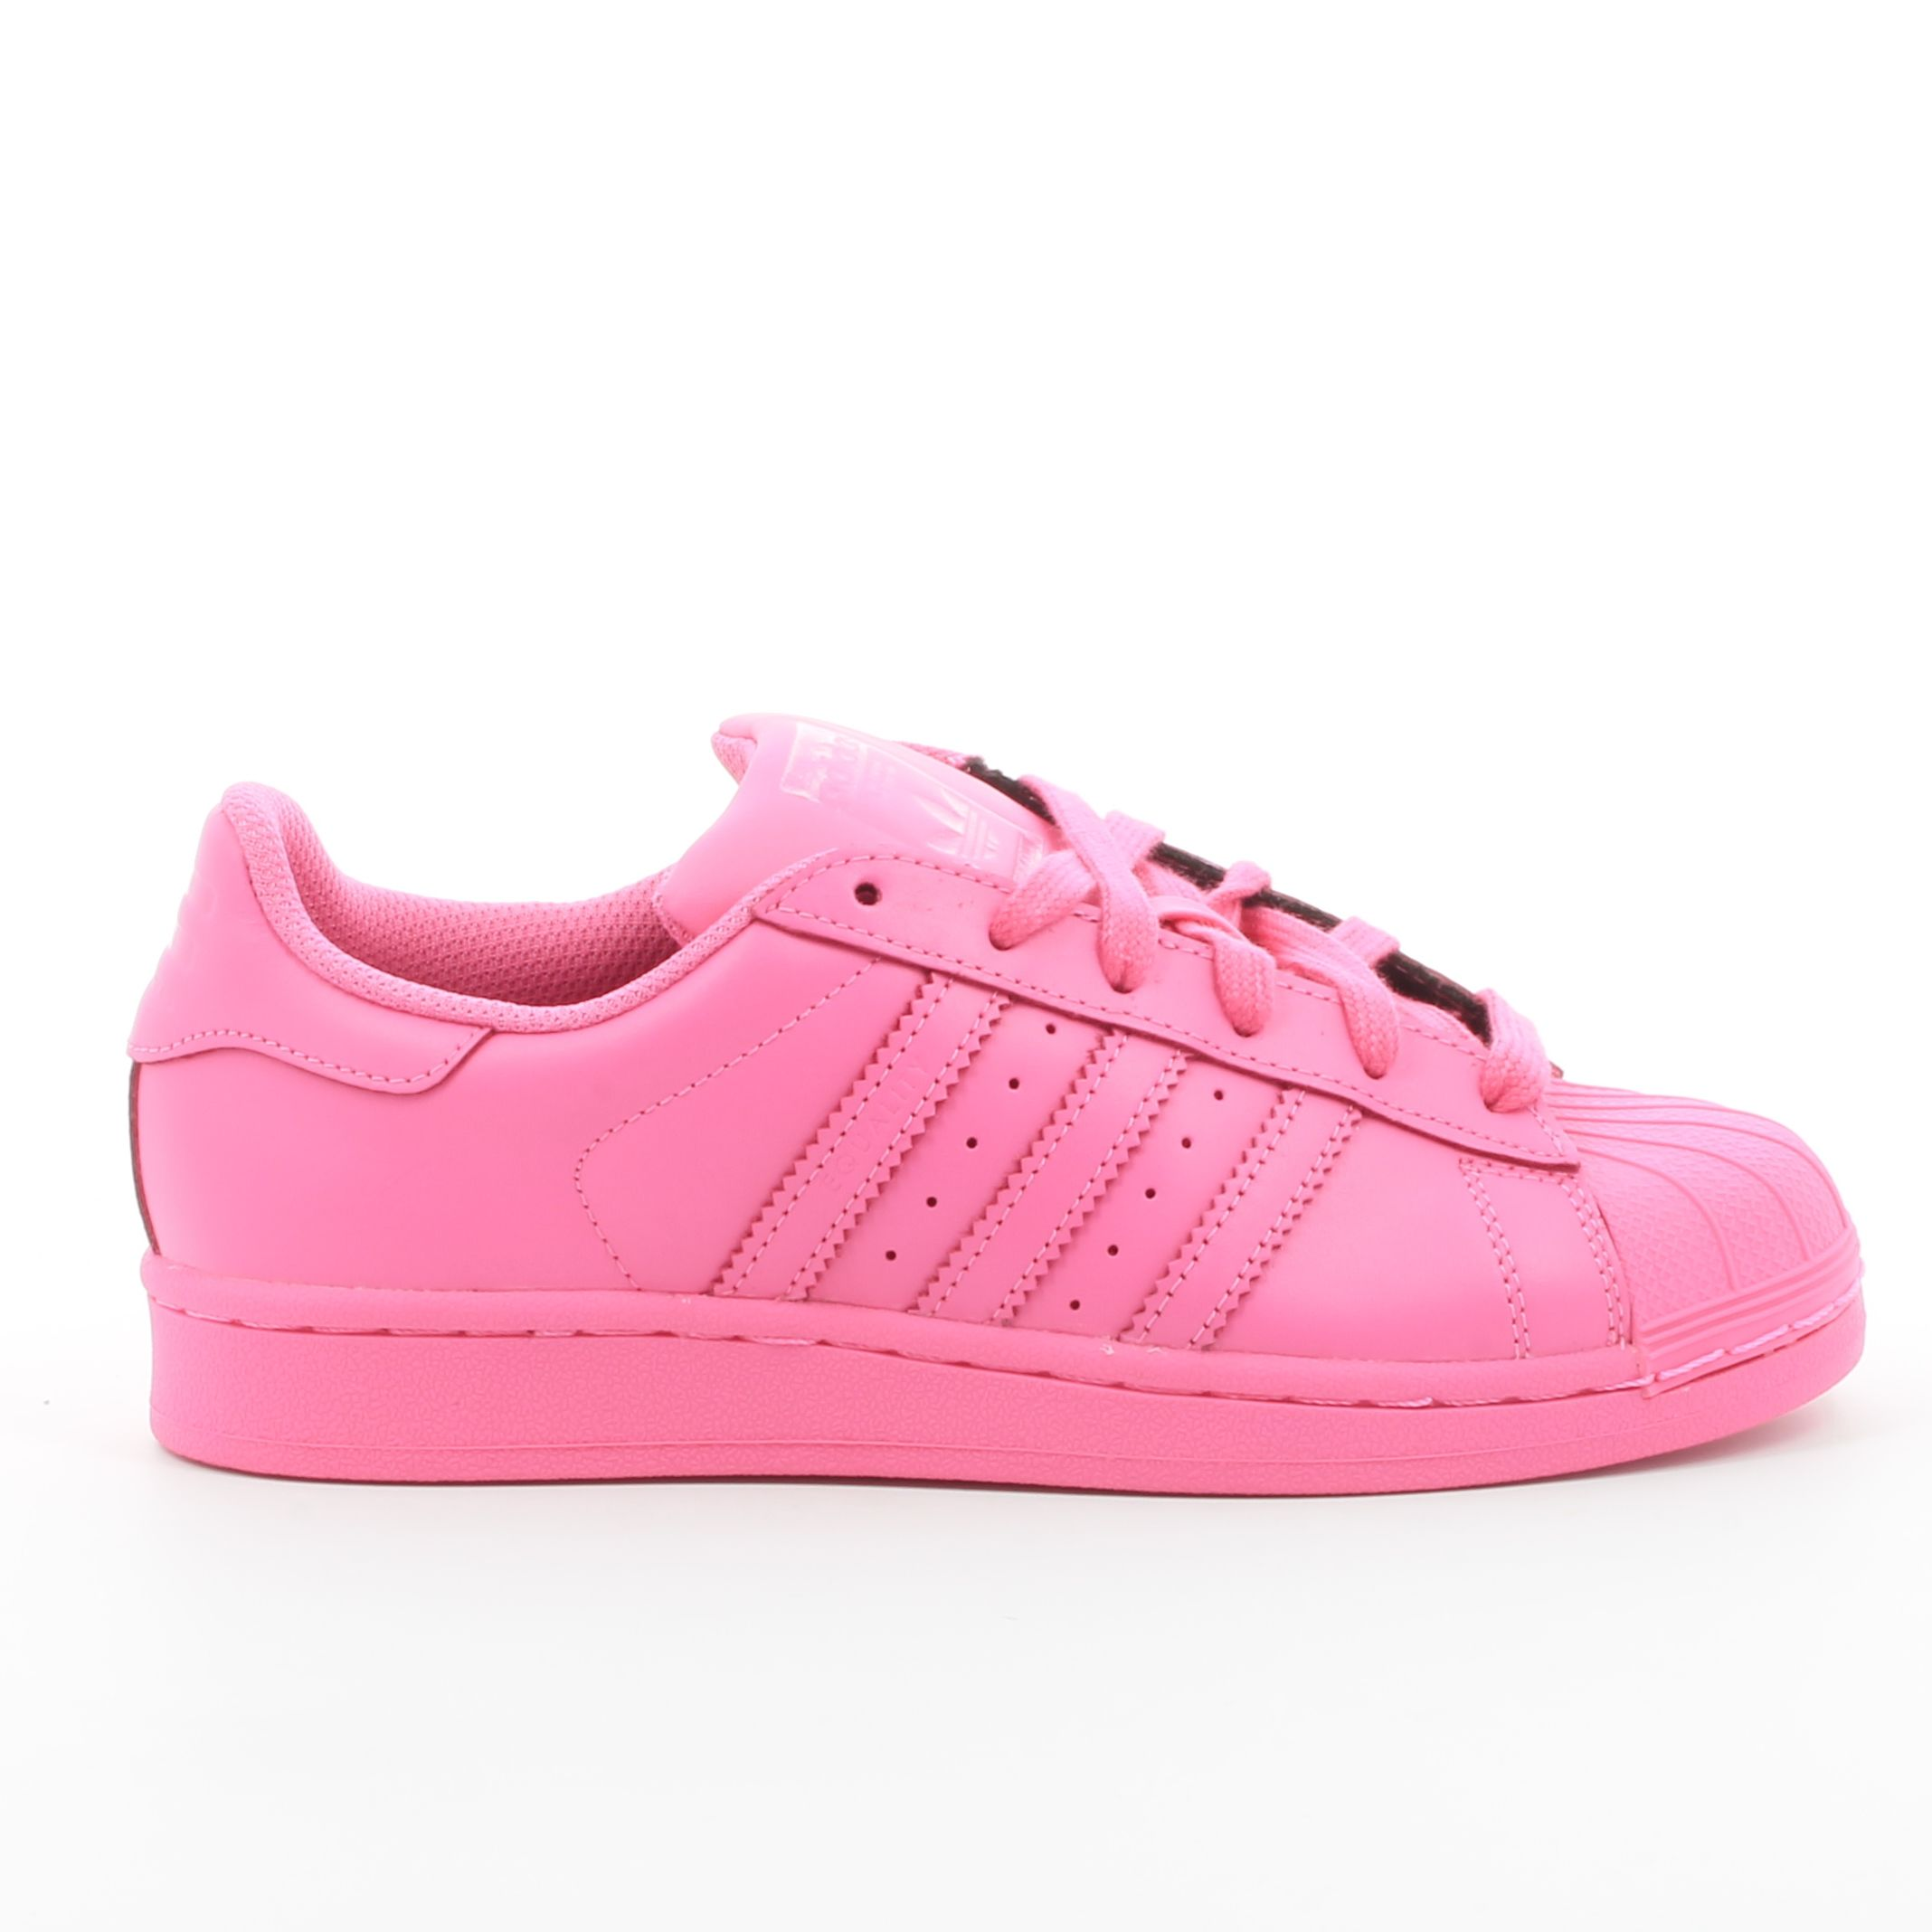 #Adidas #SuperColors #Pink #SuperStar